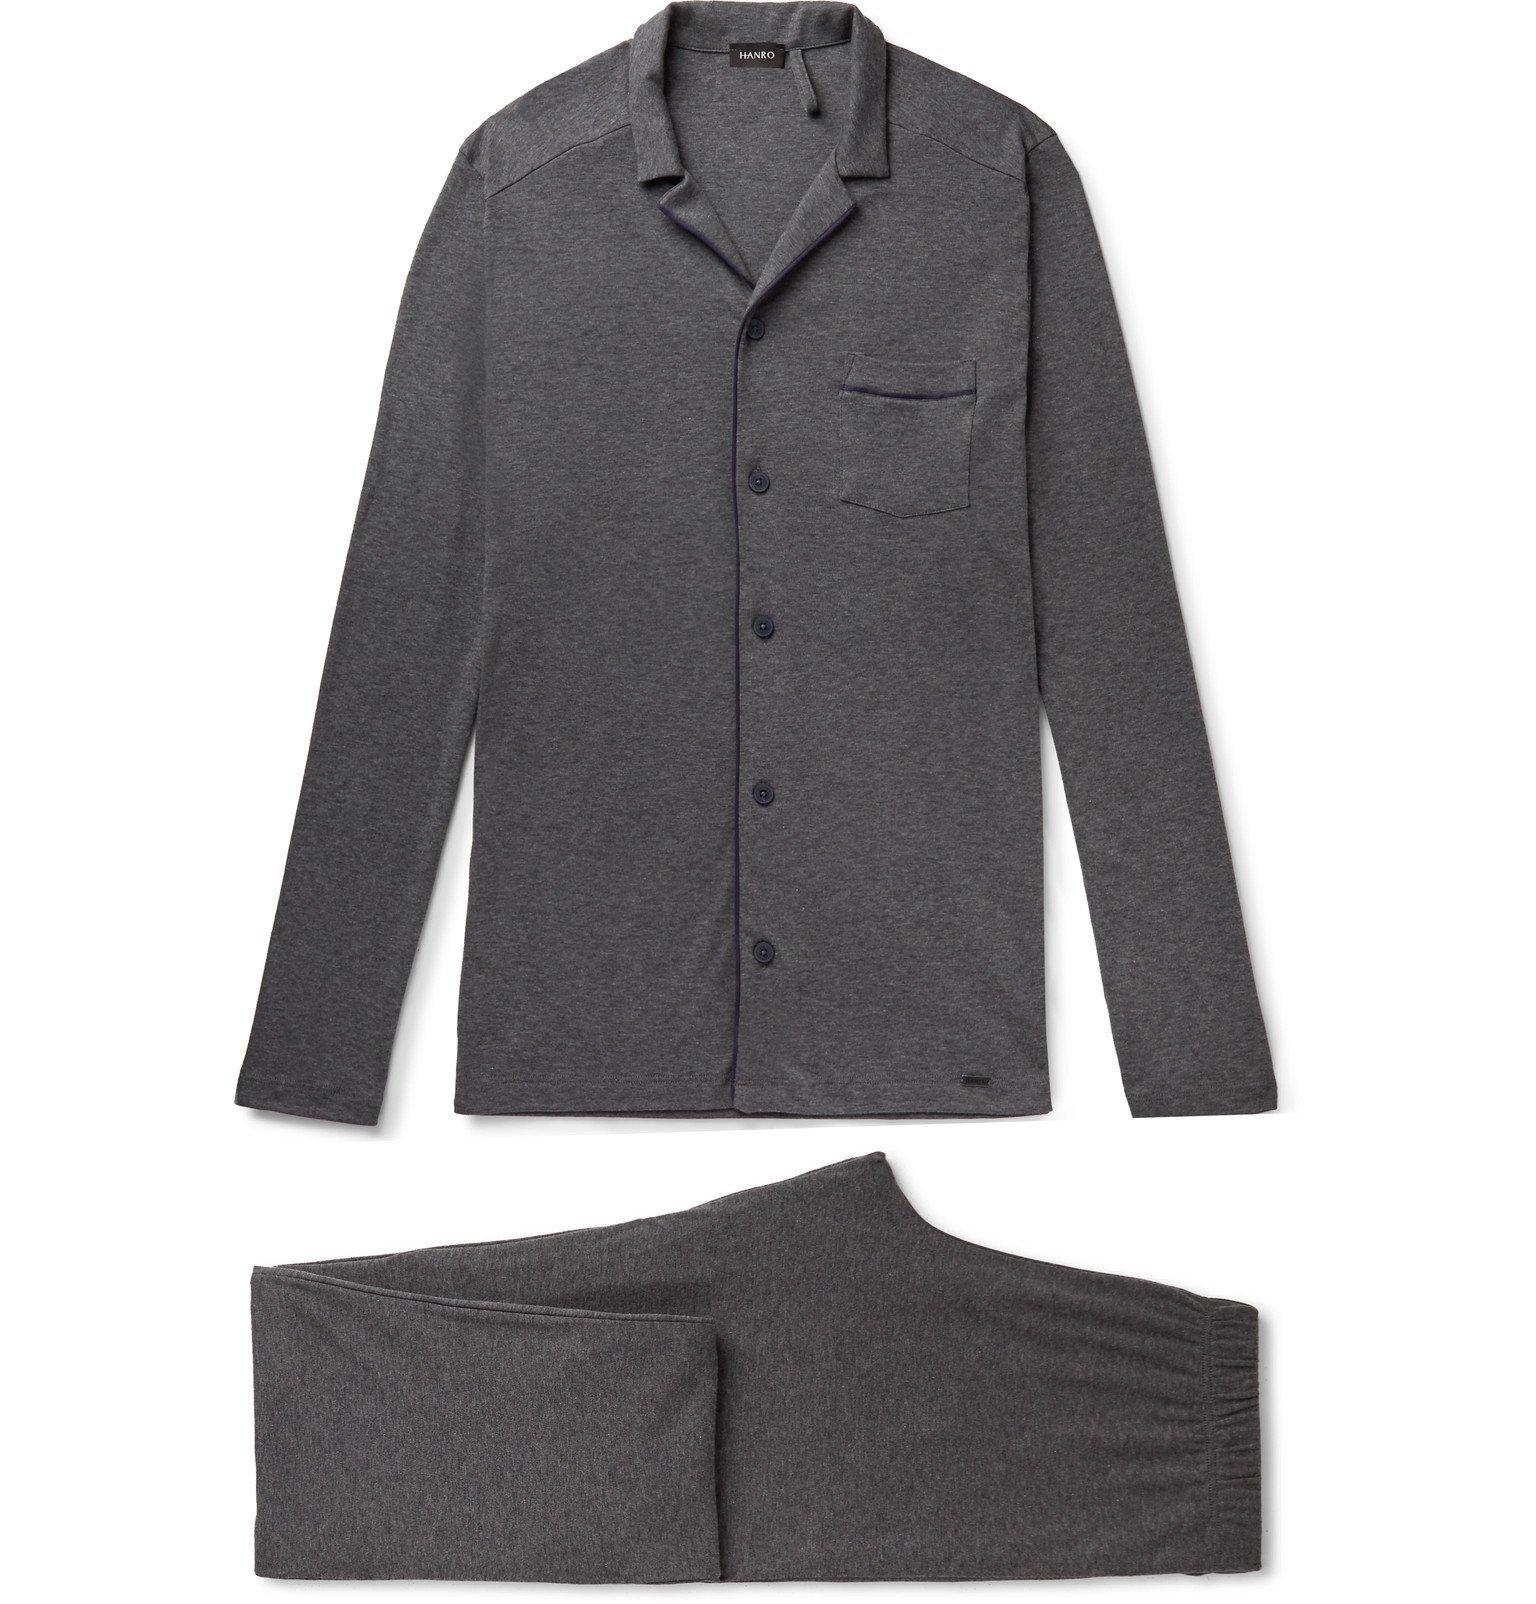 Hanro - Piped Cotton-Jersey Pyjama Set - Gray